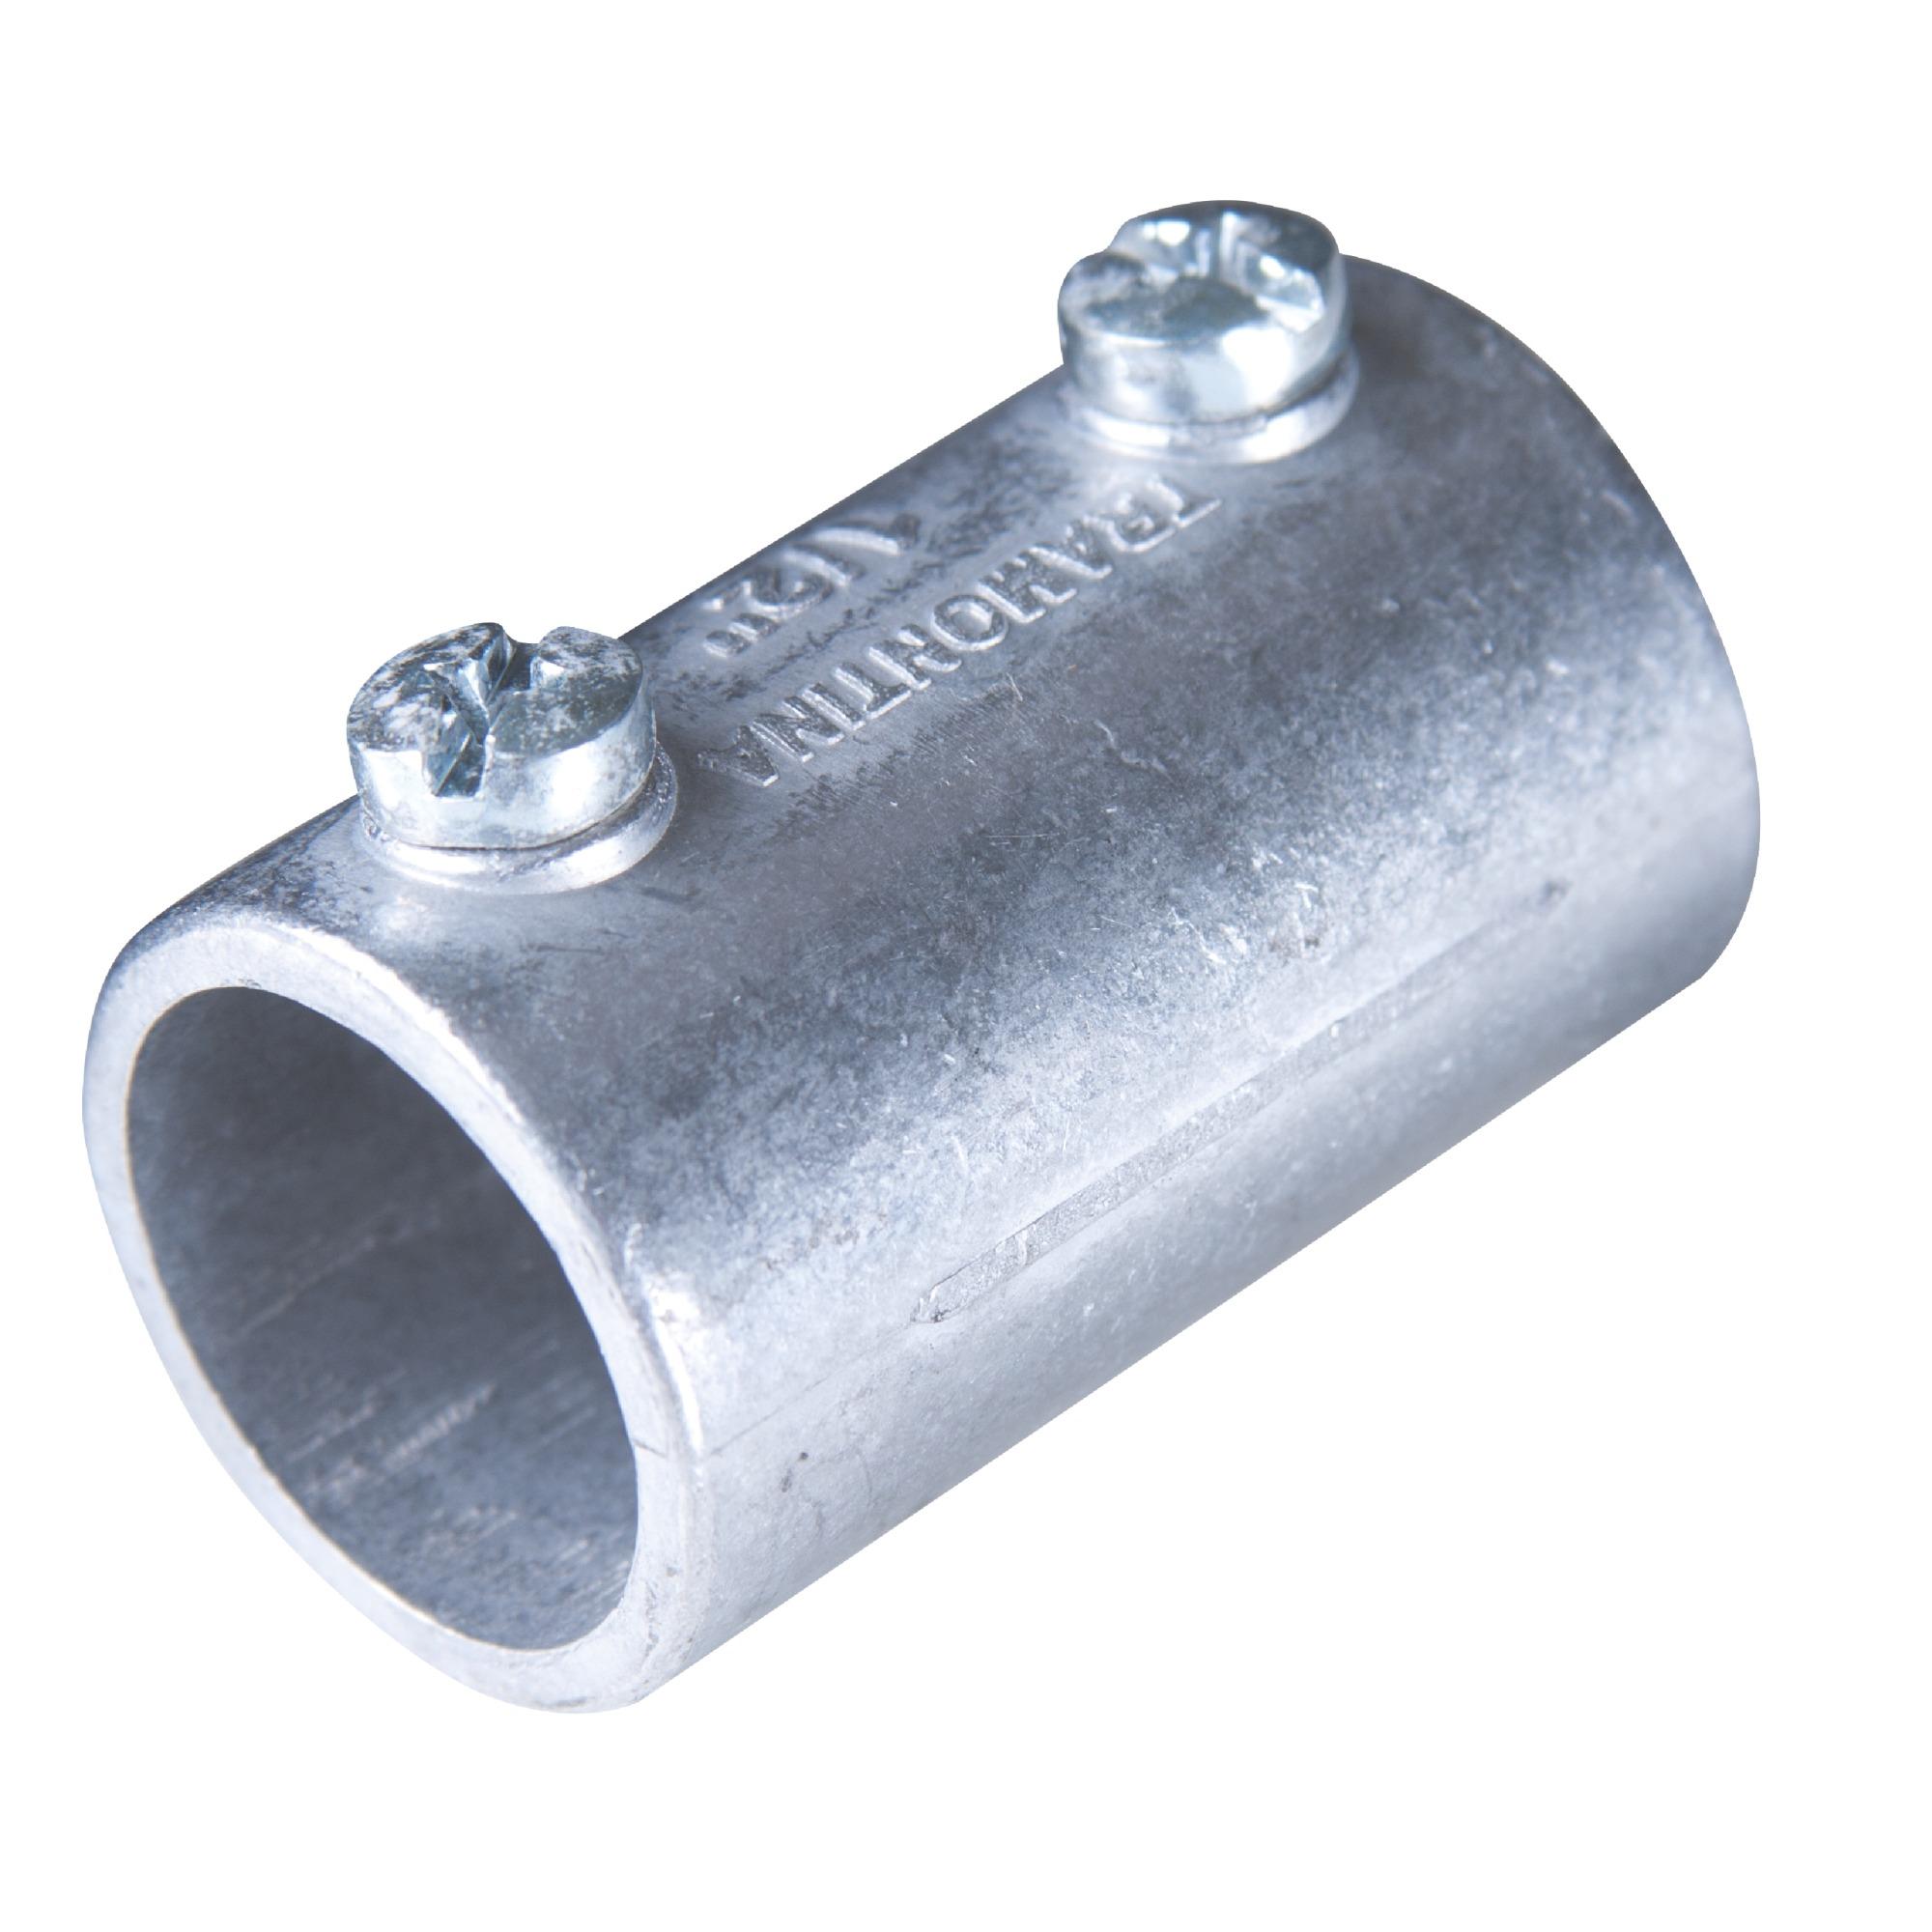 Luva Pressao 12 Aluminio Antichamas - Tramontina